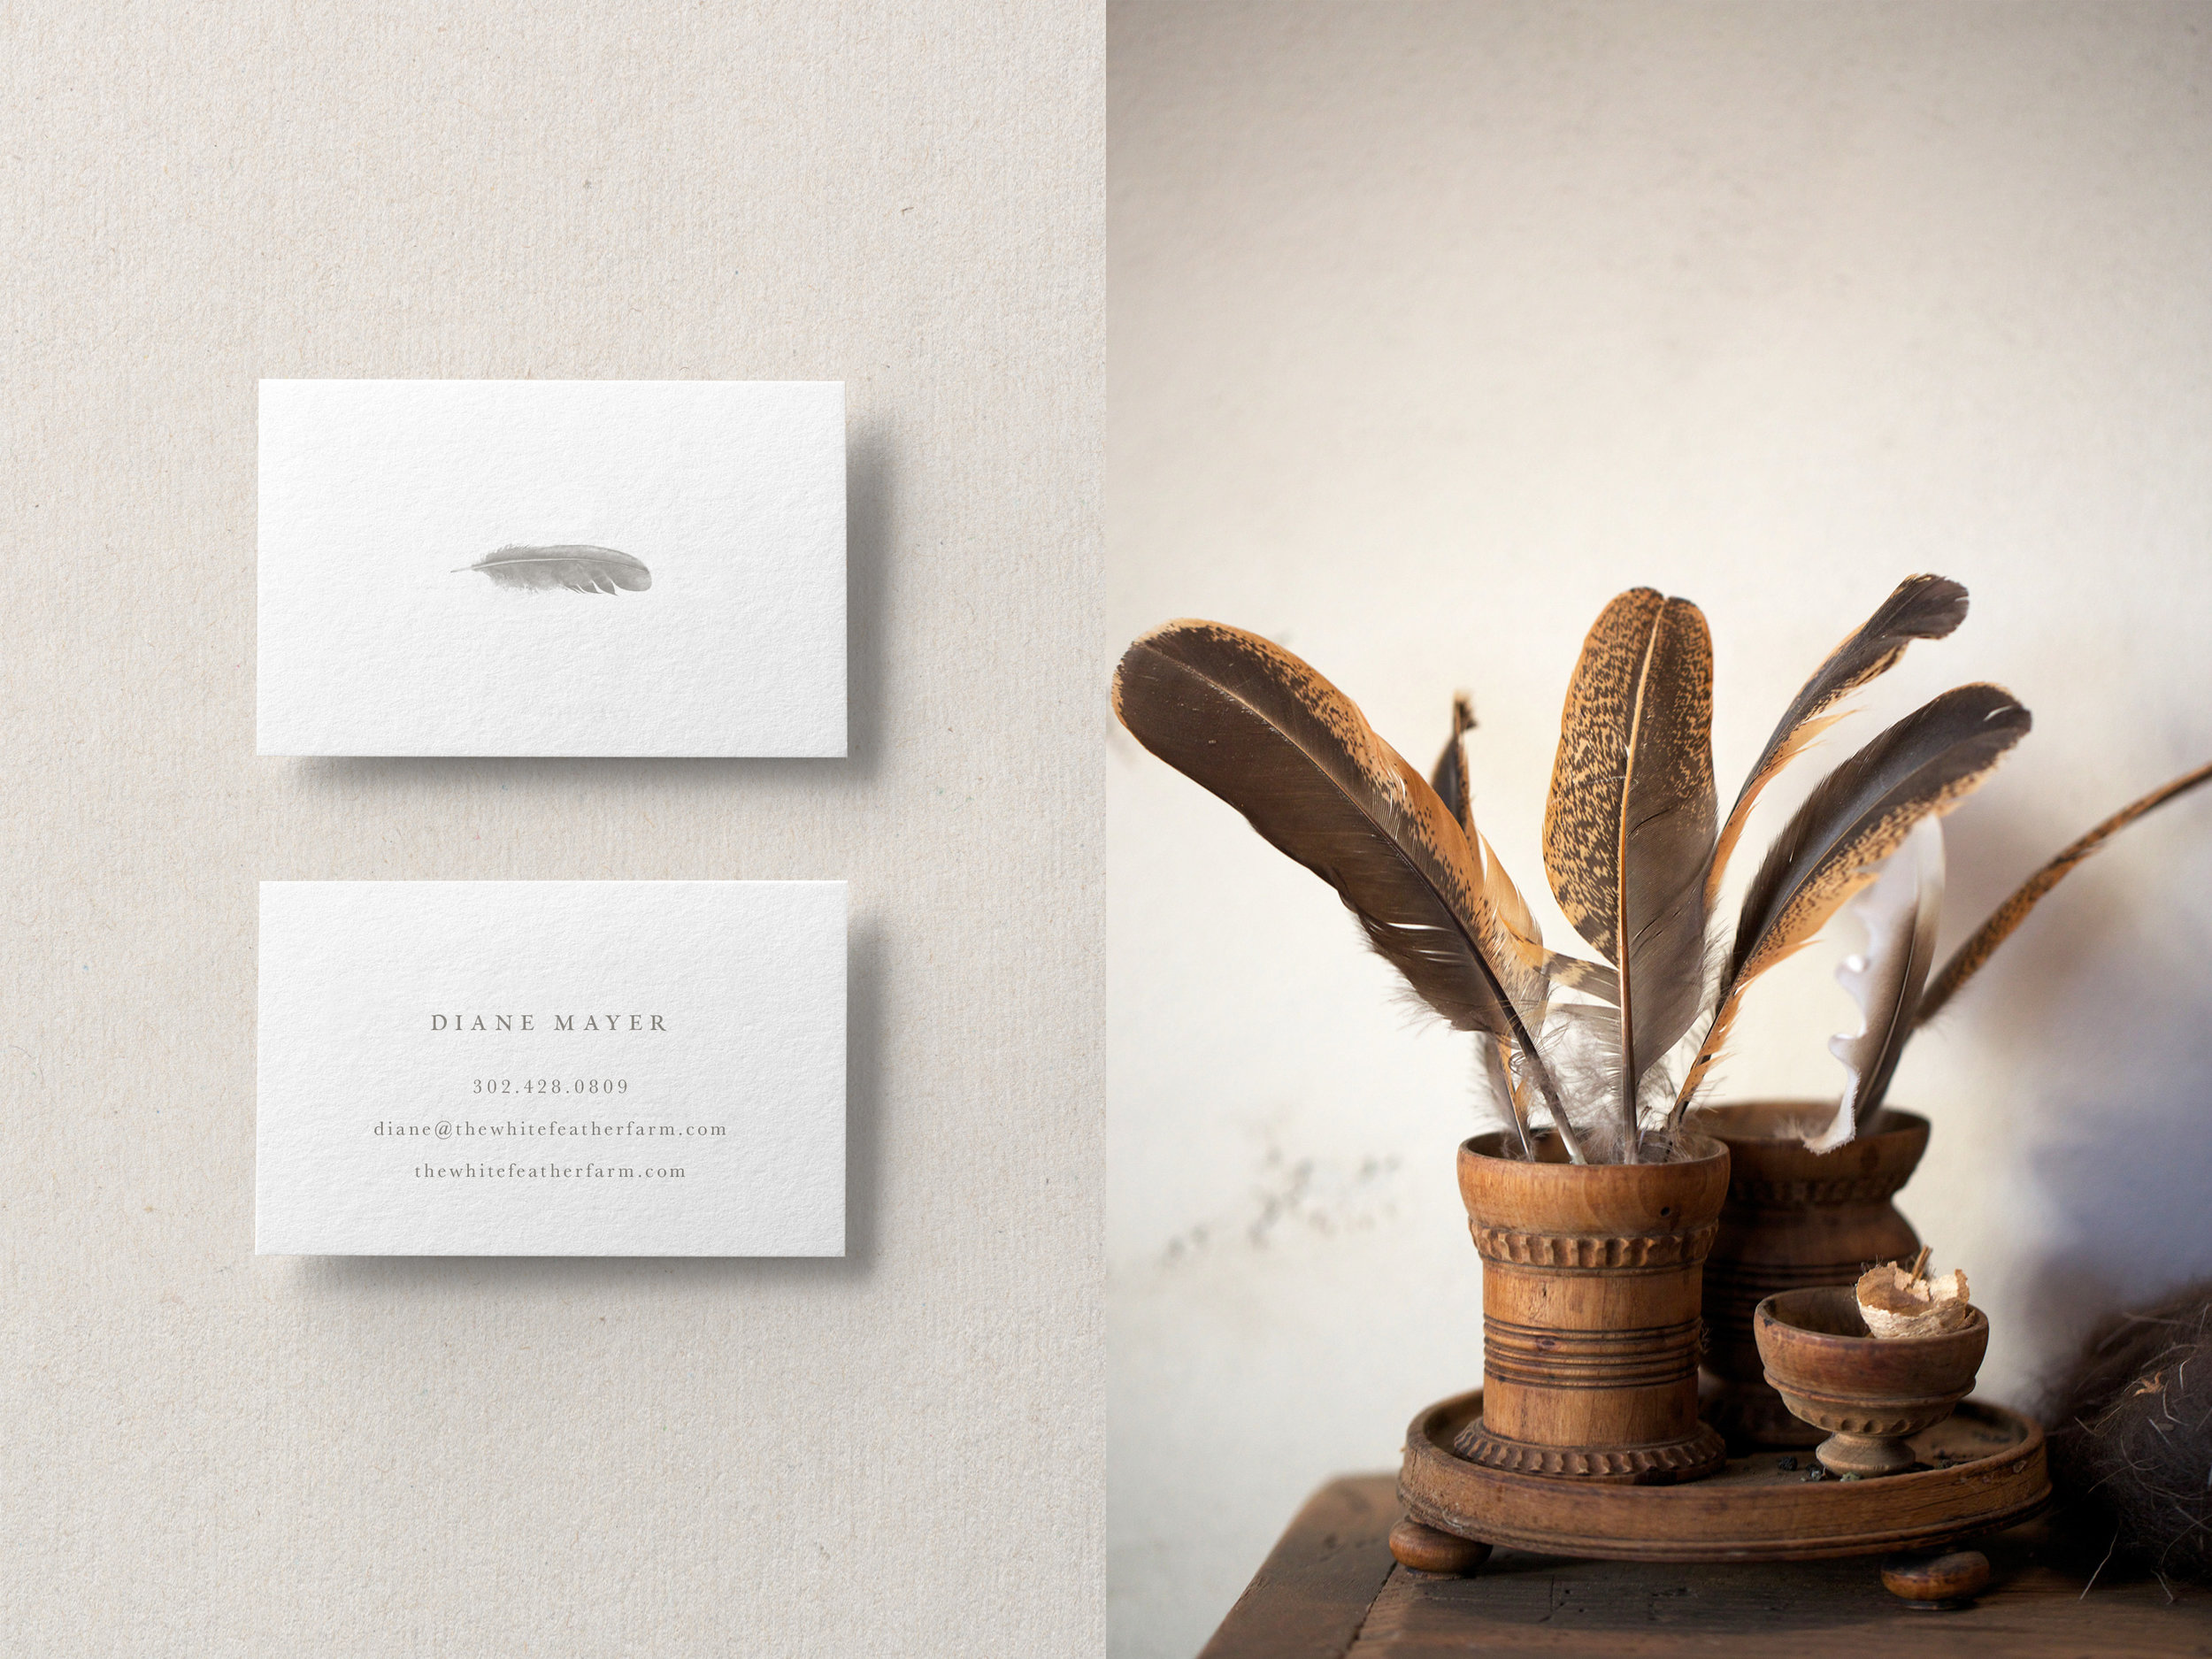 White-Feather-Farm-Business-Cards-Kraft-Shaman-Altar_Light copy.jpg